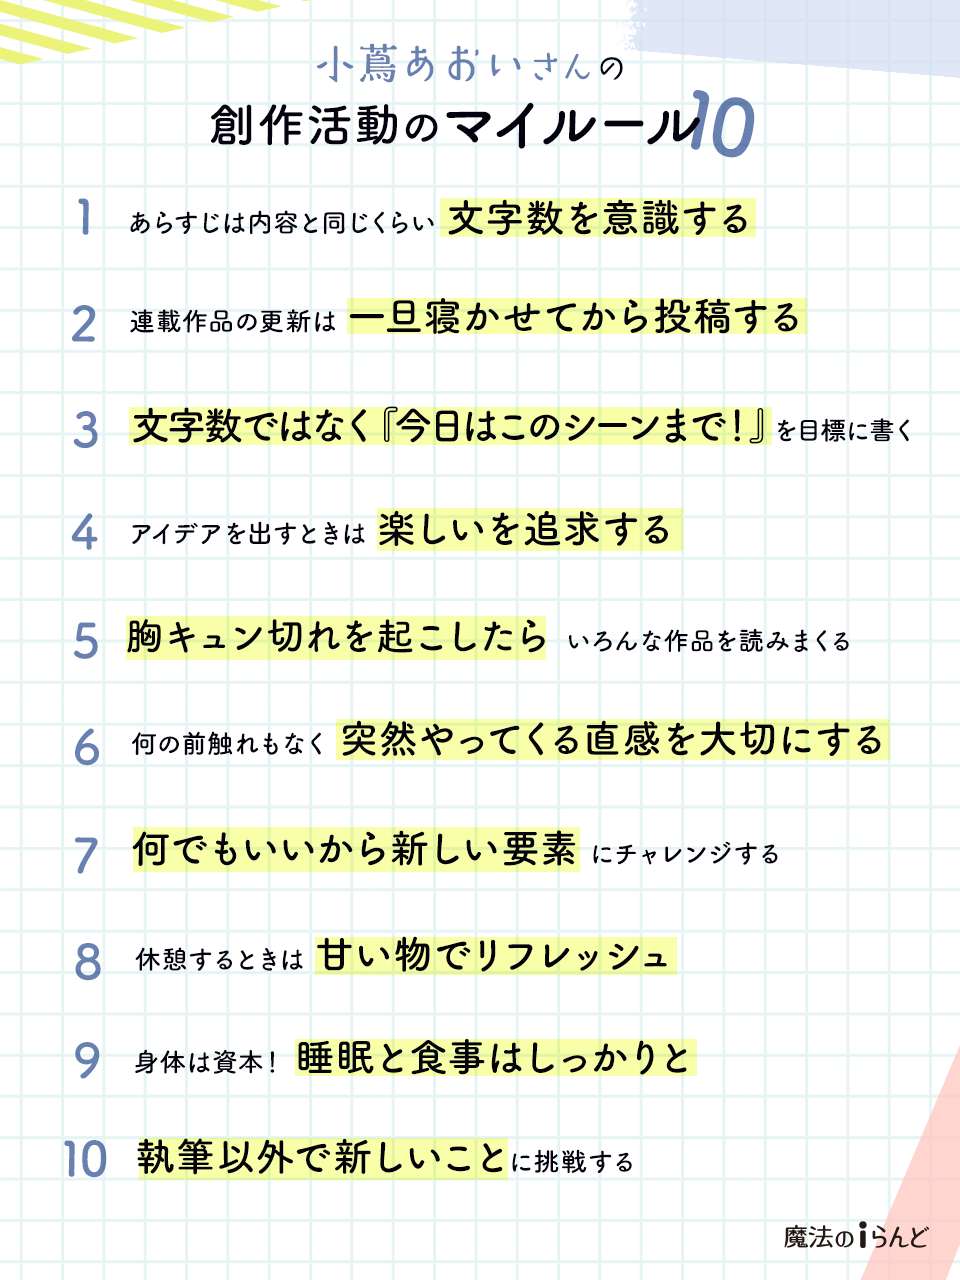 https://storage.googleapis.com/blog-info/entry/2021/08/04-myrule-kozsuta_twitter.png